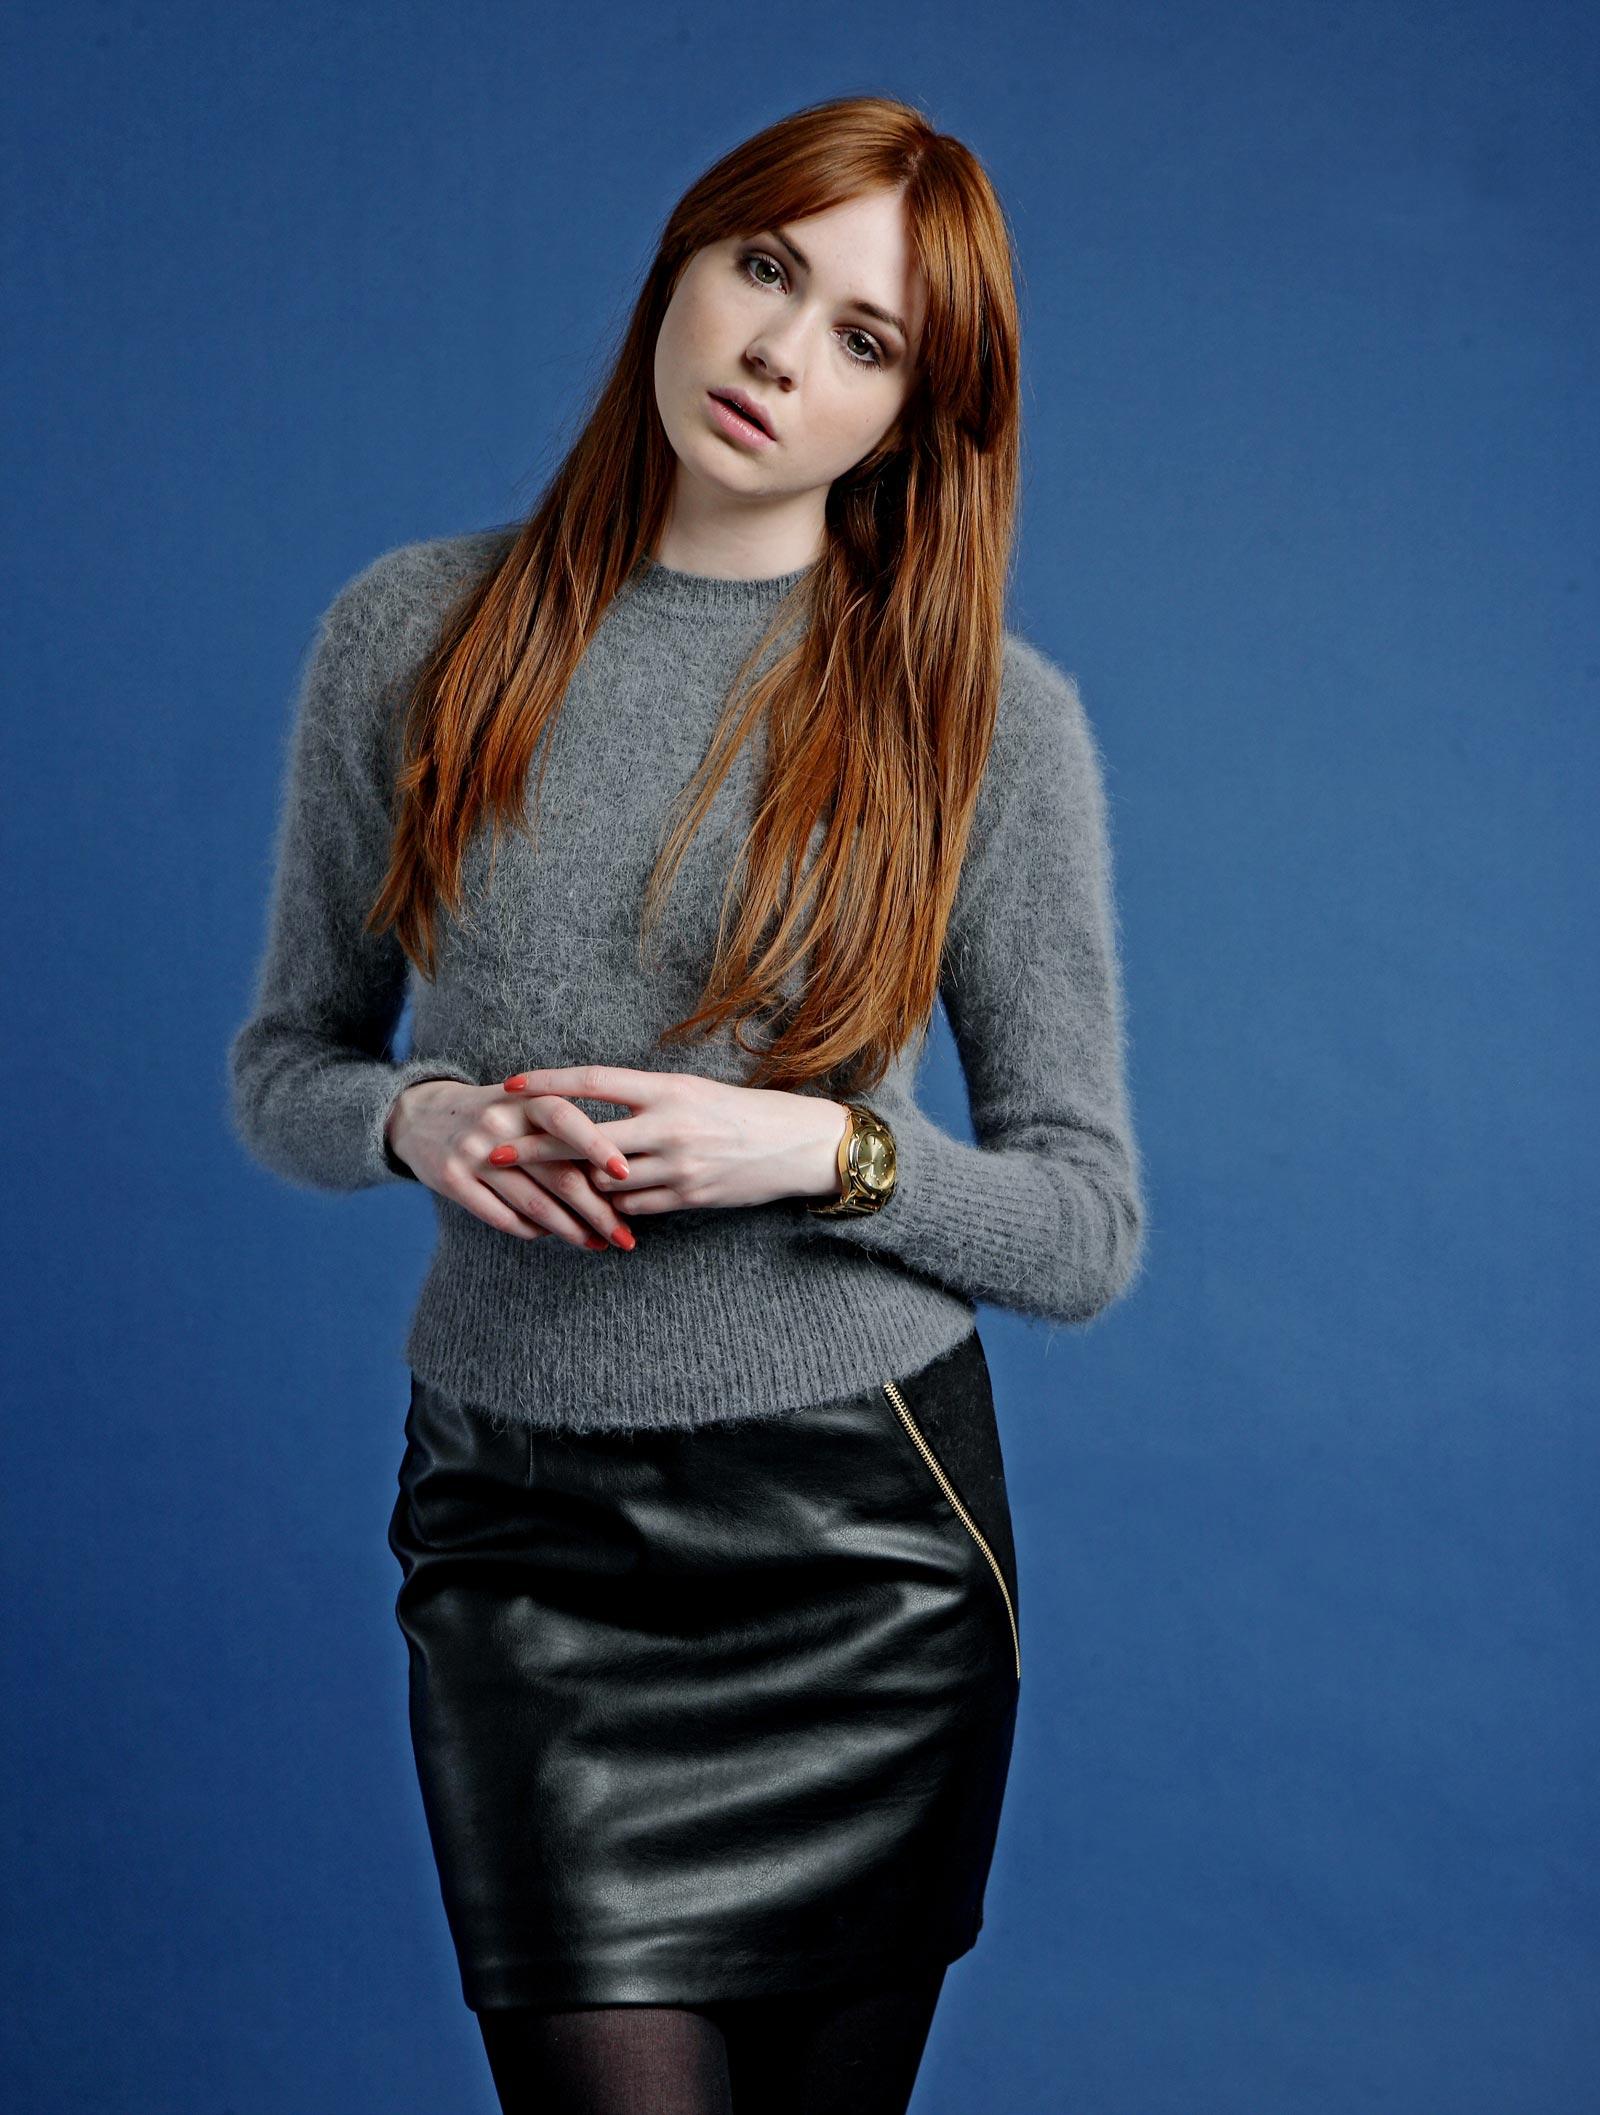 Karen Gillan Guardian photoshoot - Leather Celebrities Rihanna Instagram